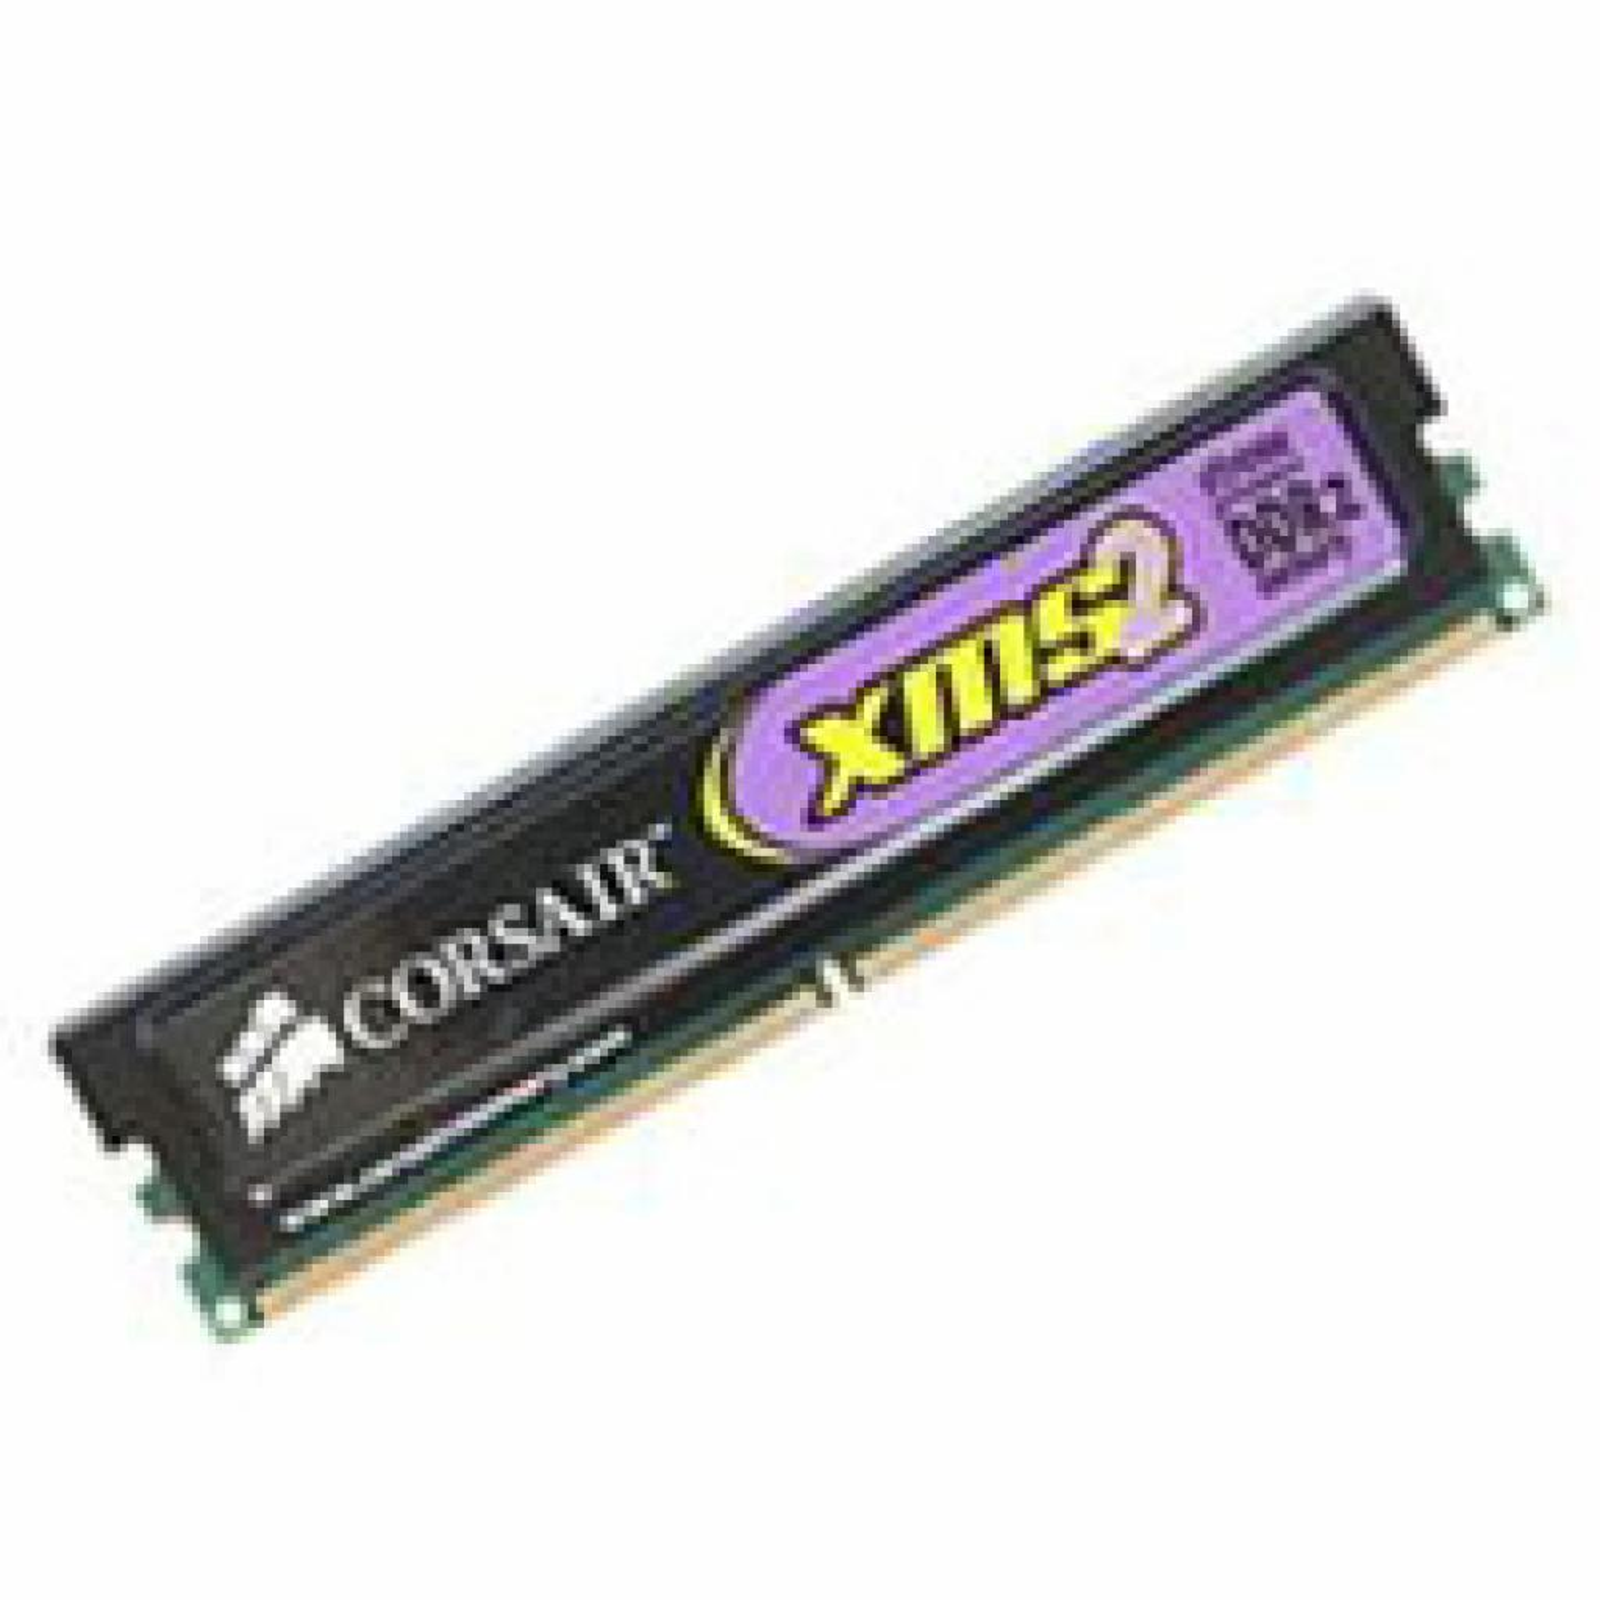 Модуль памяти для компьютера DDR2 2GB 800 MHz CORSAIR (CM2X2048-6400C5)